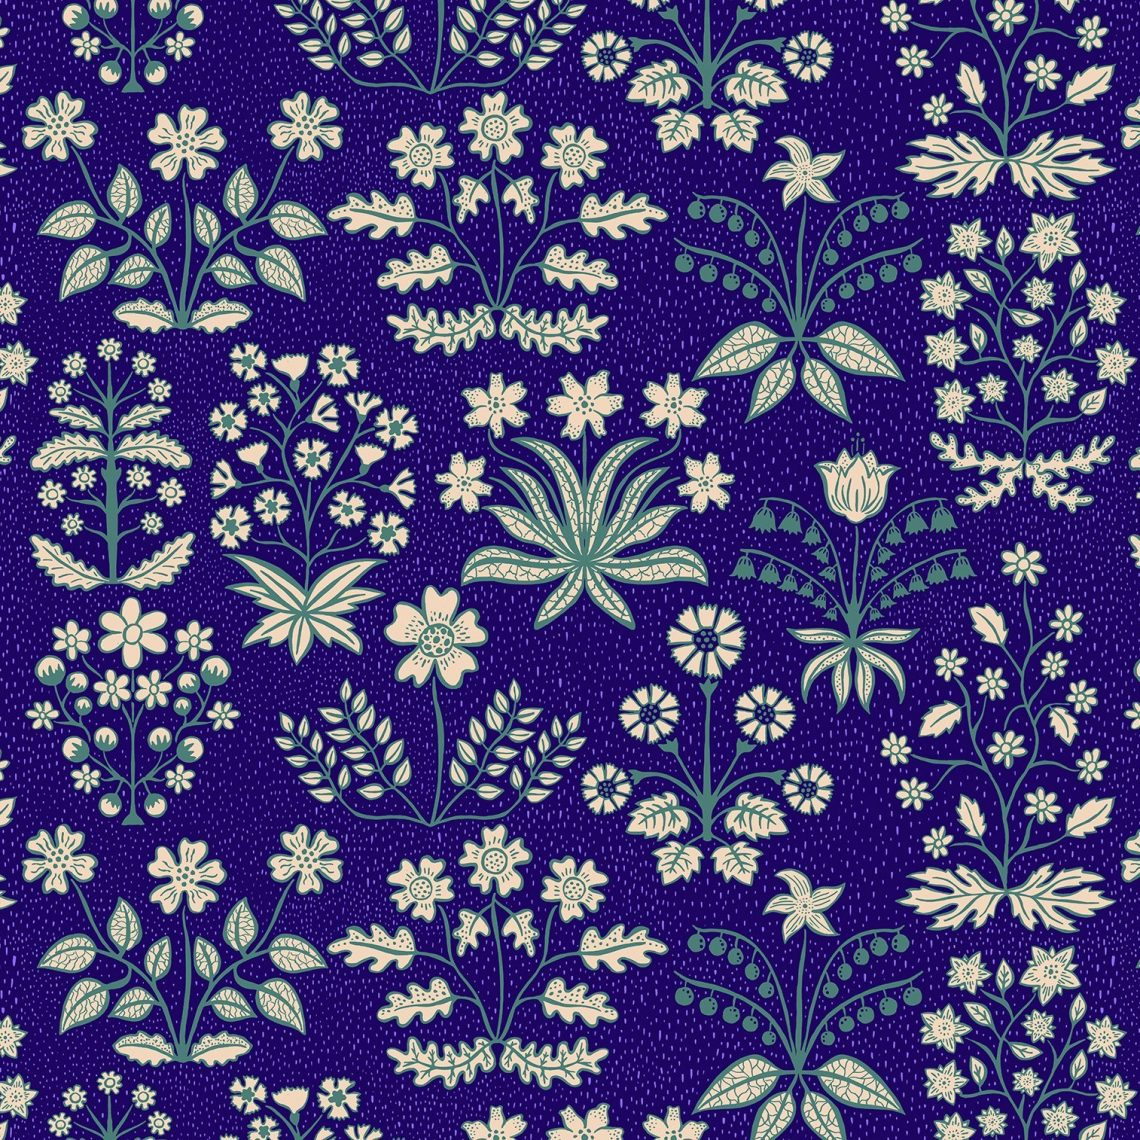 Josie Shenoy Botanica Fabric - Blue